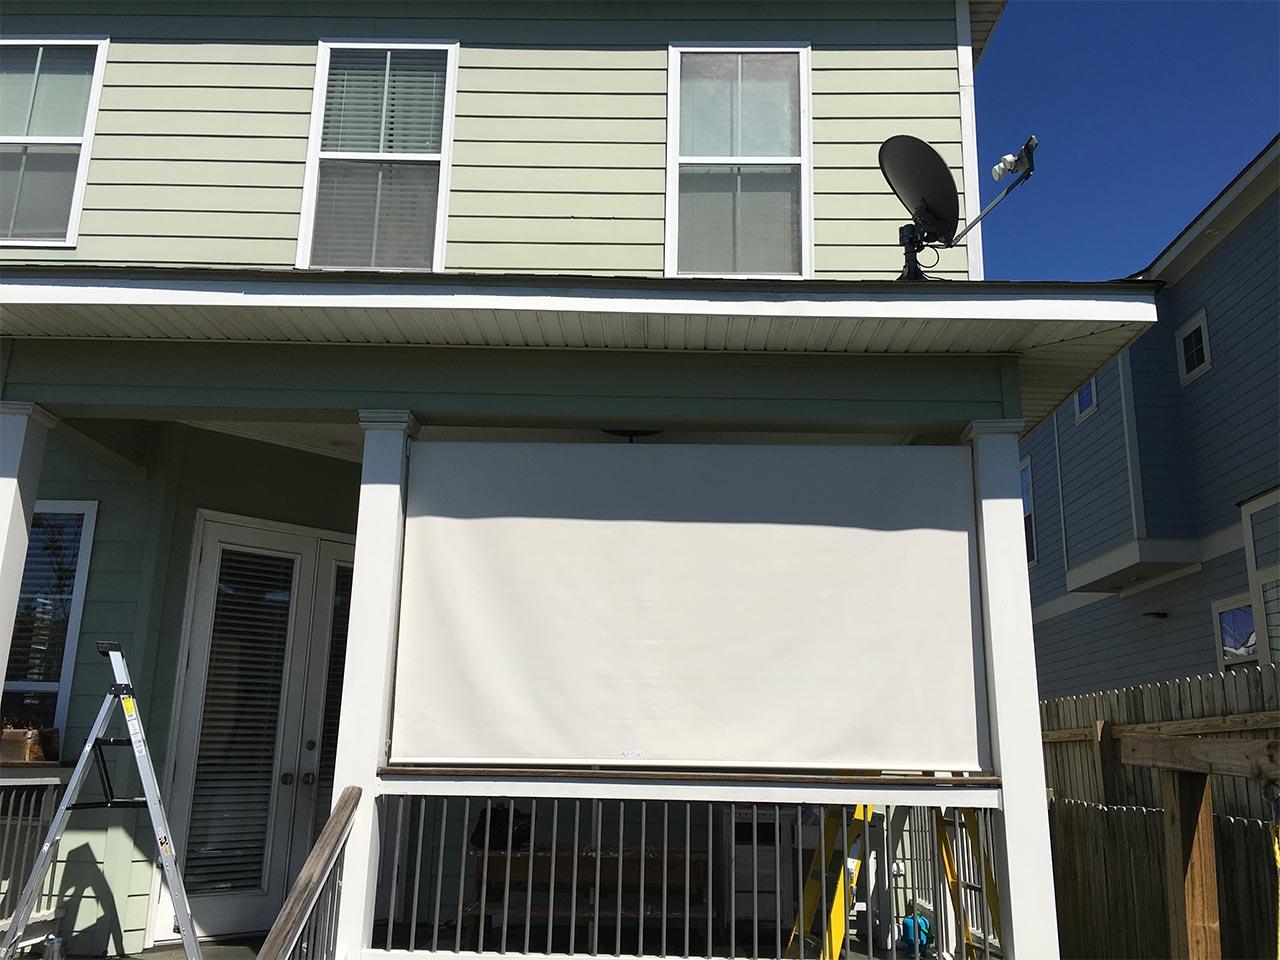 SKANDIA Solar Shades outside